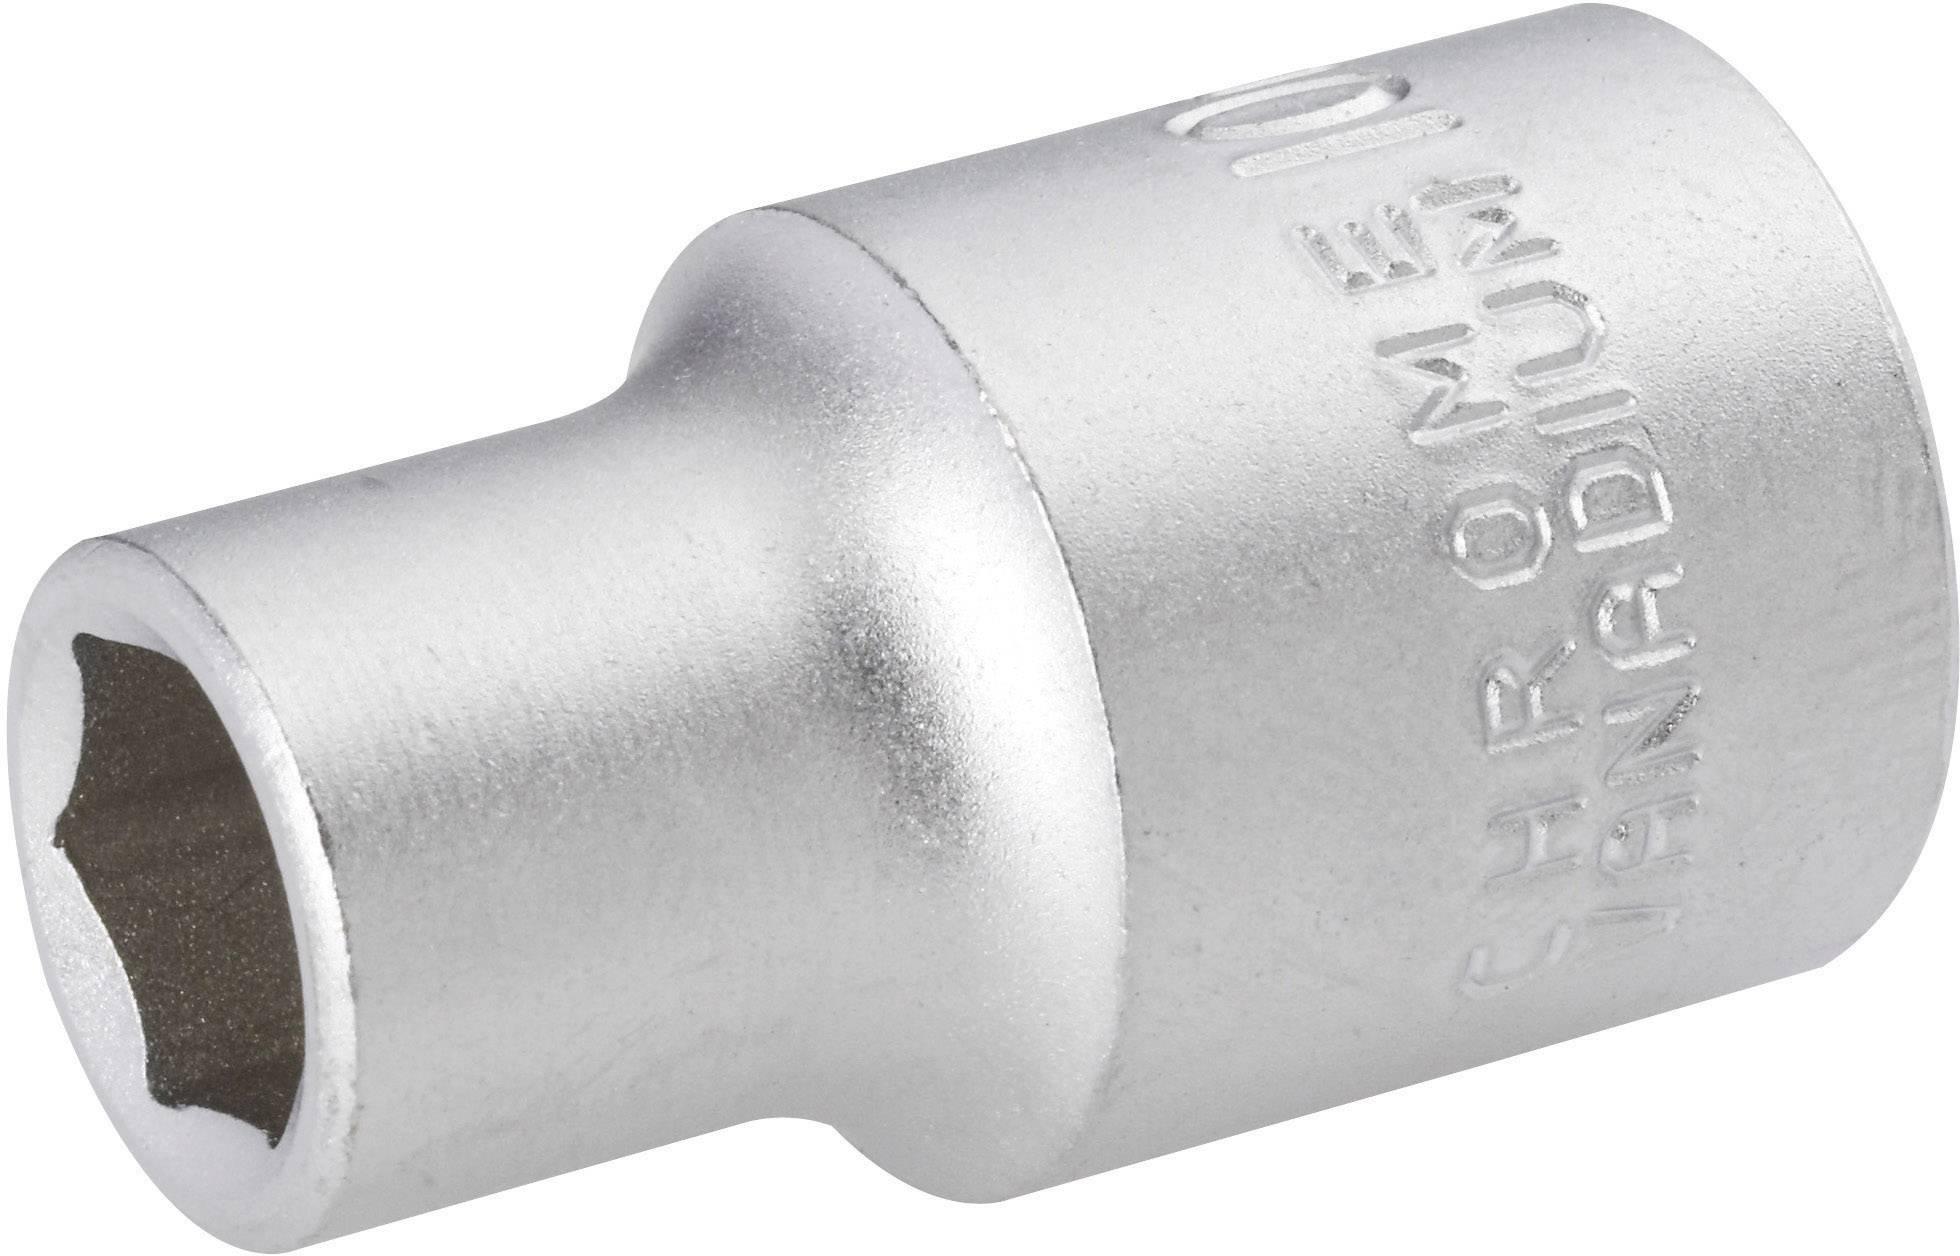 "Nadstavec na račňu TOOLCRAFT 820771, 1/2"" (12.5 mm), 17 mm"